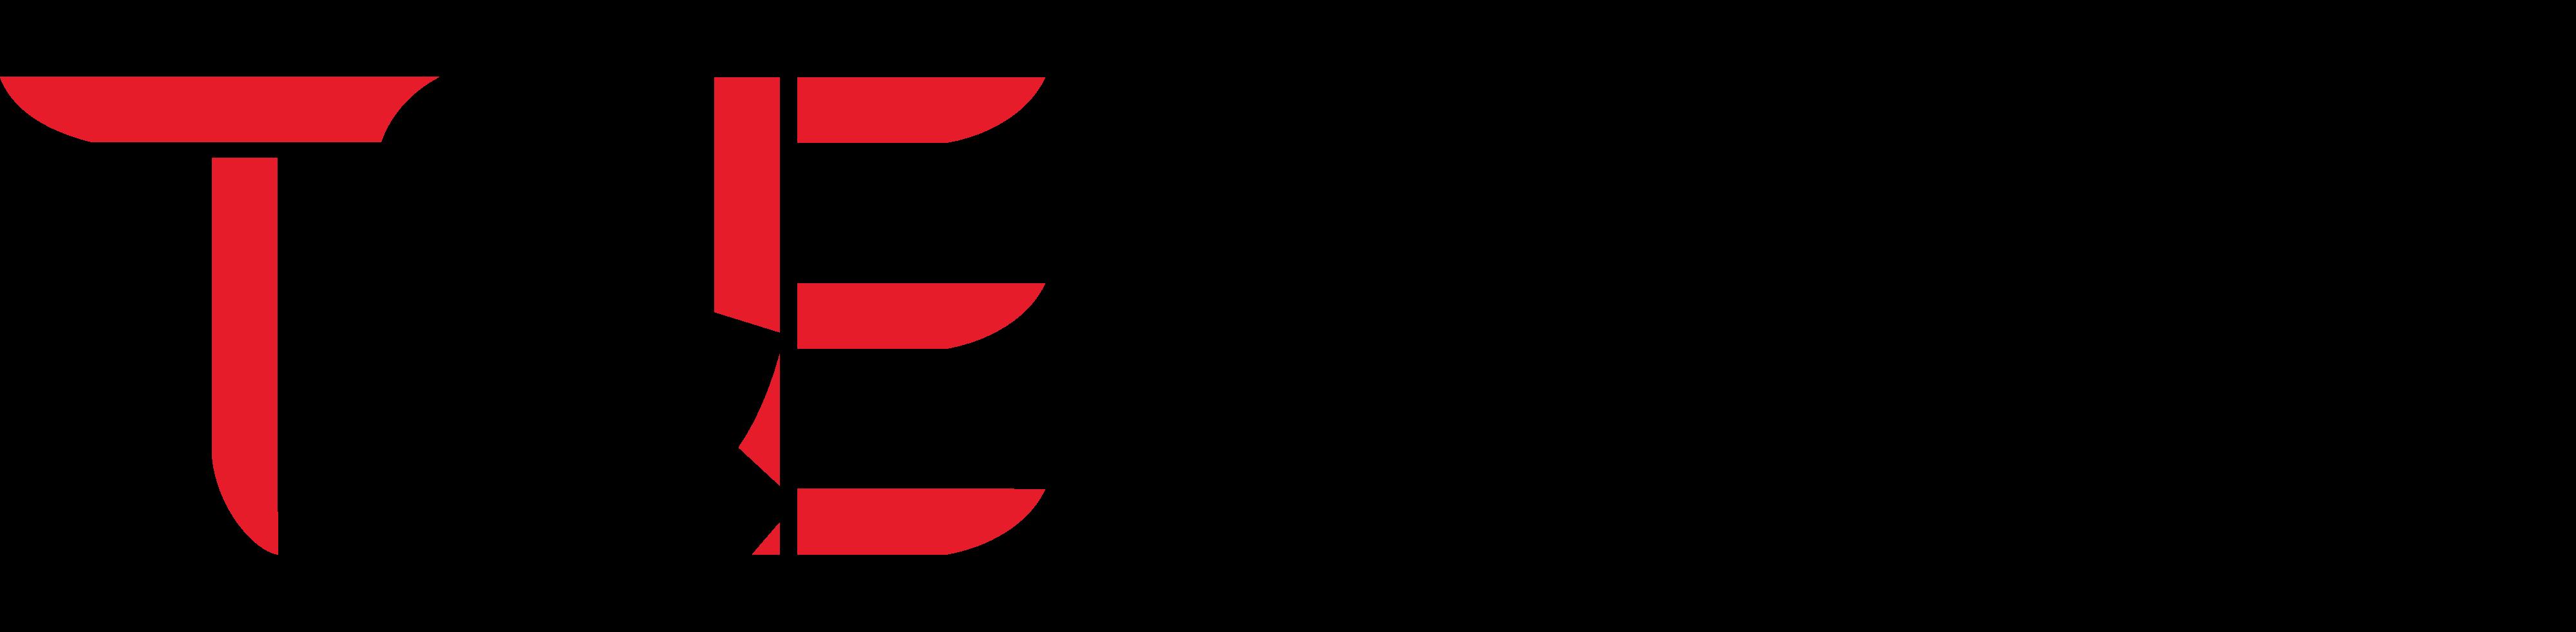 T&Emagazin – Tesla, E-Mobilität, Regenerative Energien